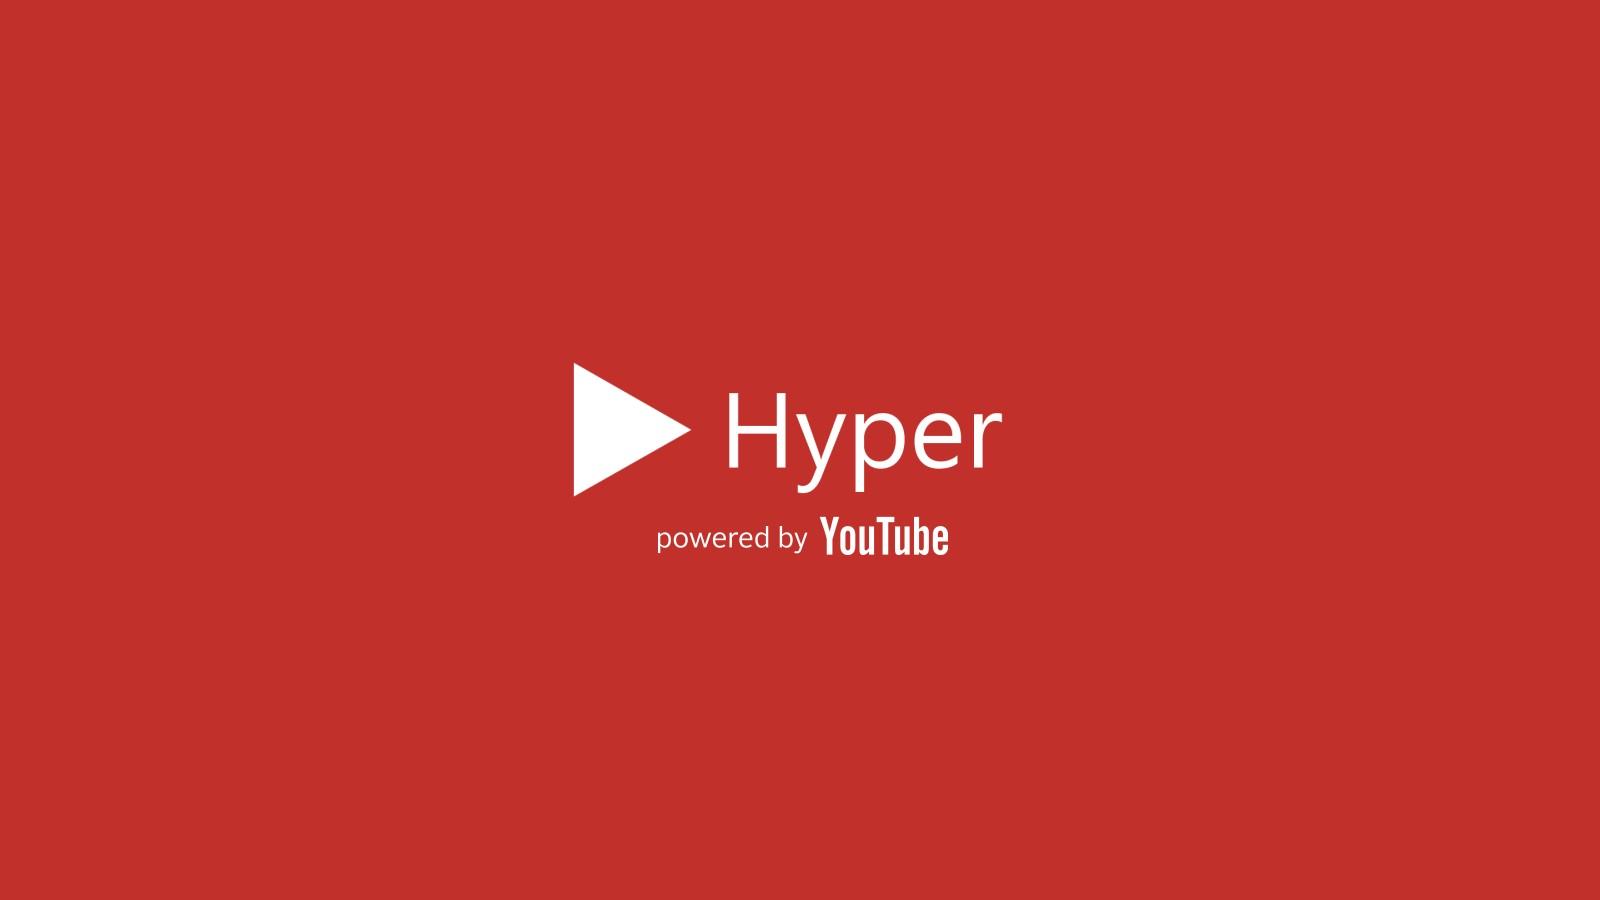 Hyper - удобная Modern UI программа для просмотра видео из YouTube (10)